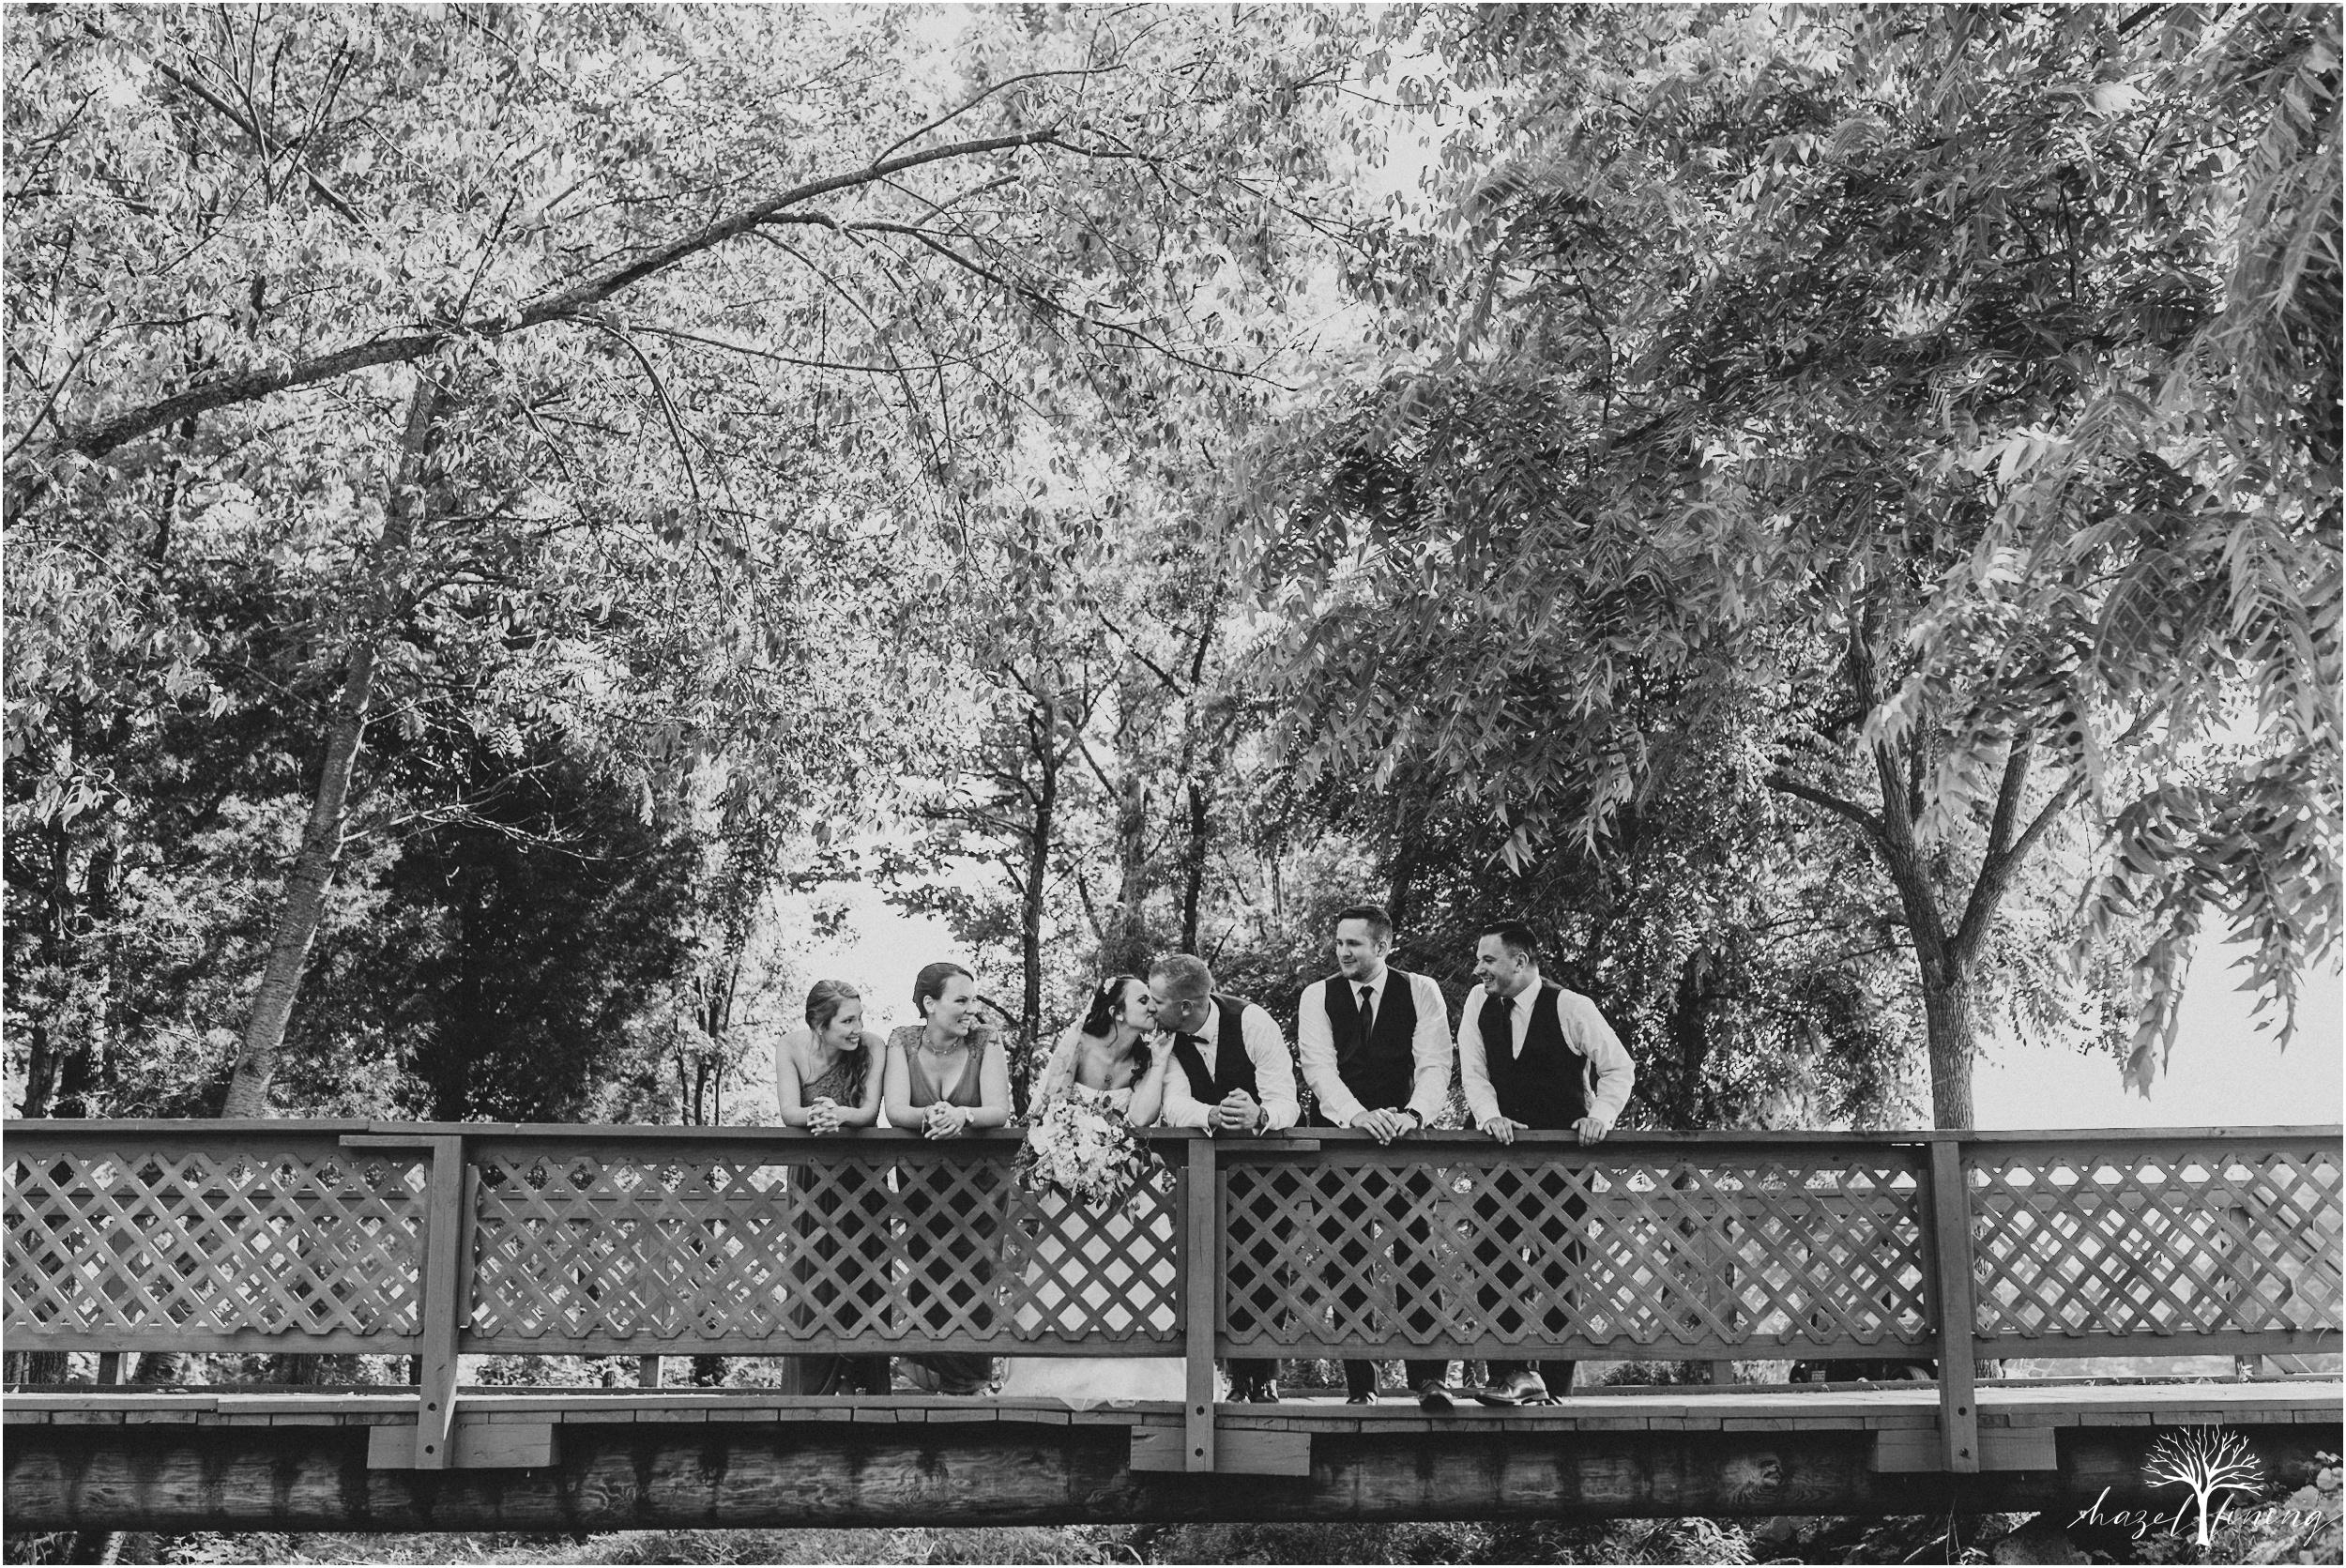 alyssa-james-stiteler-wedding-loft-and-sweet-water-cc-pennsburg-pennsylvania-hazel-lining-travel-wedding-elopement-photography_0079.jpg